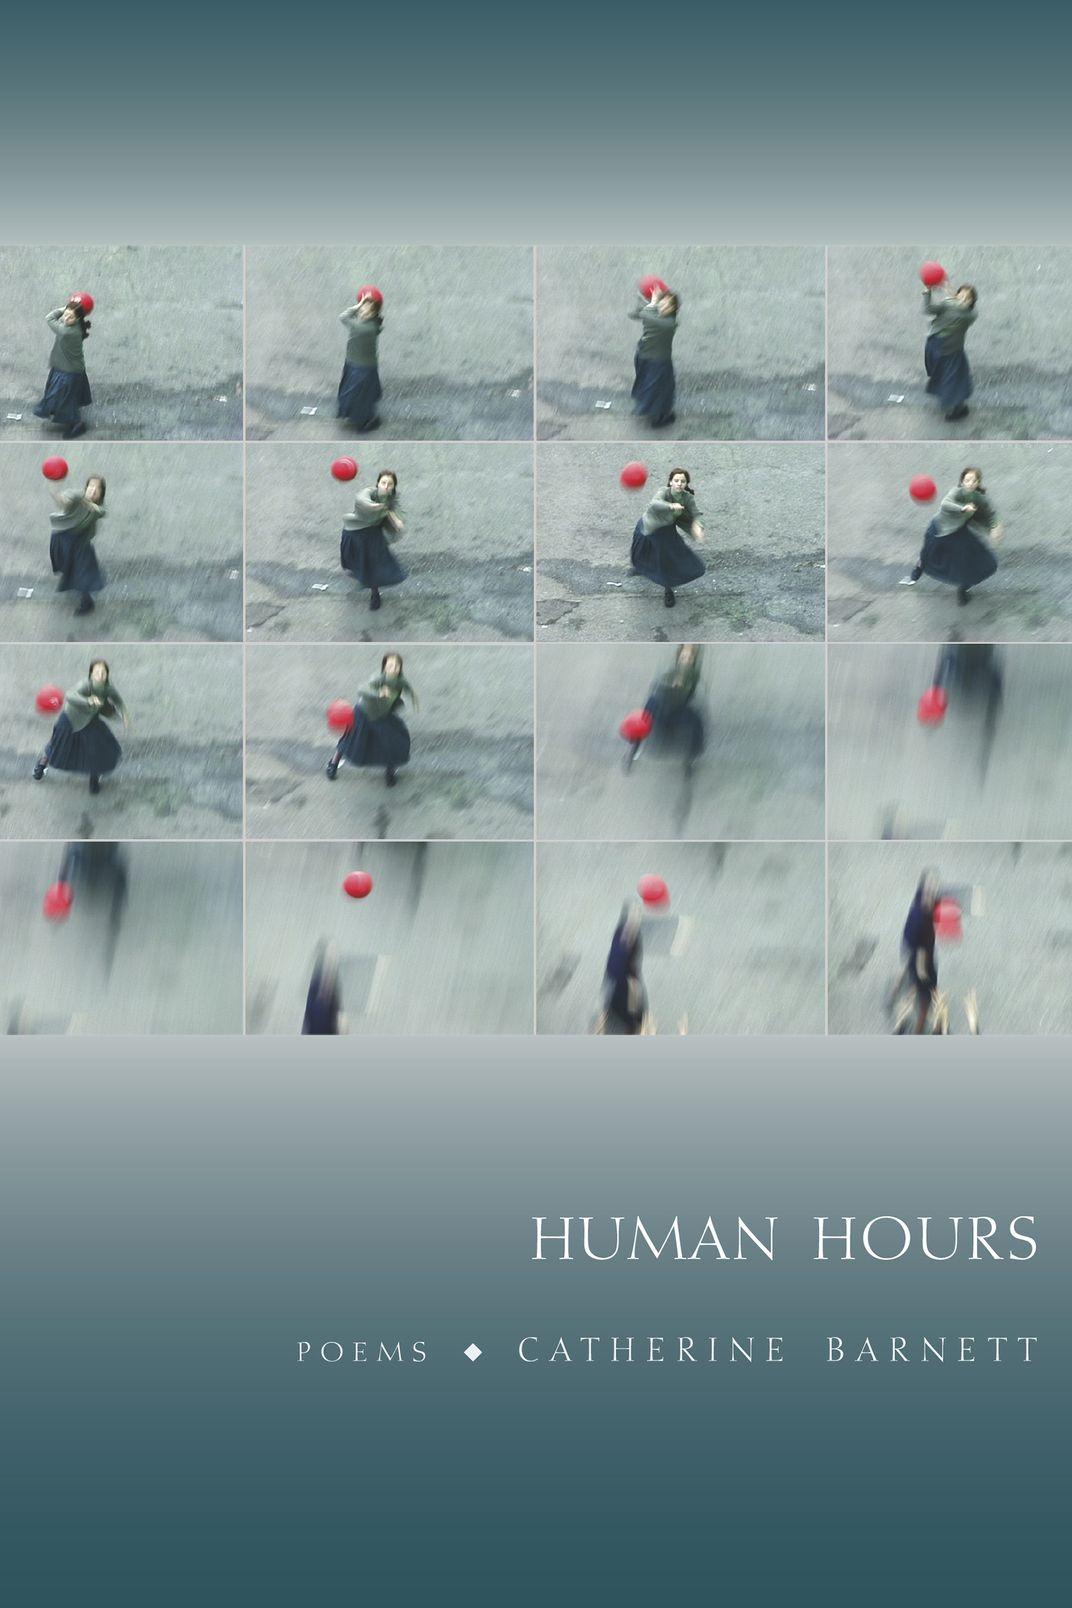 Human Hours, by Catherine Barnett (Graywolf Press)